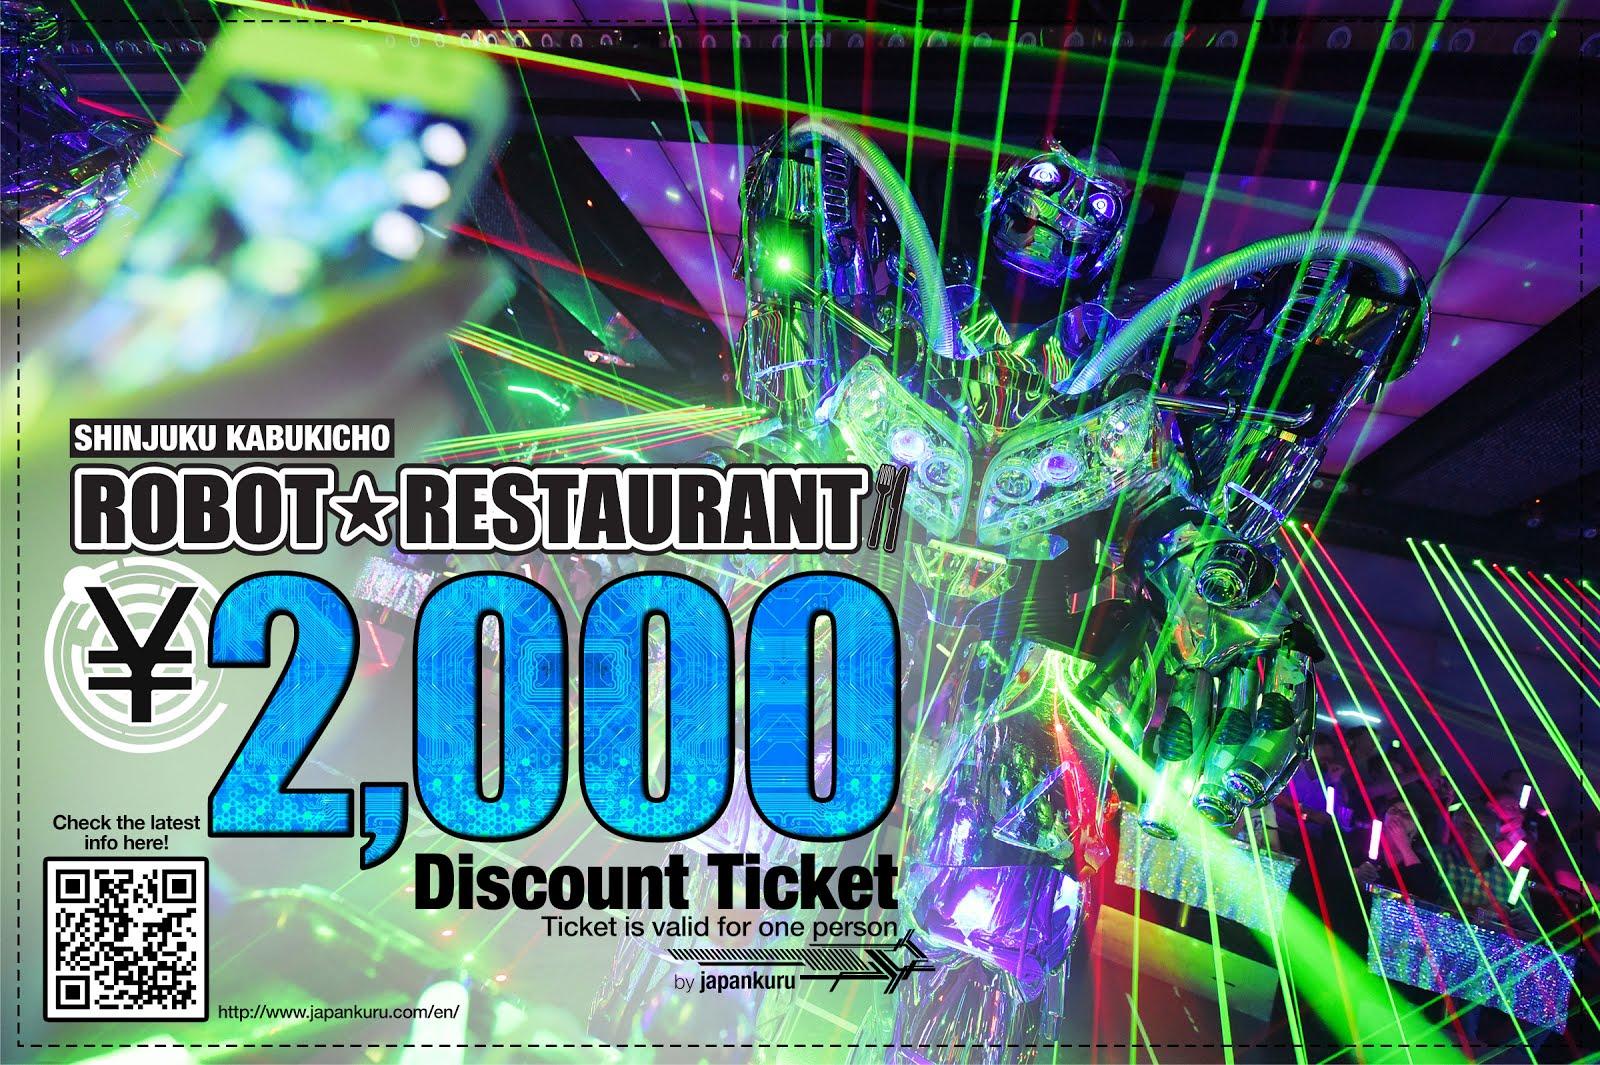 Robot restaurant discount